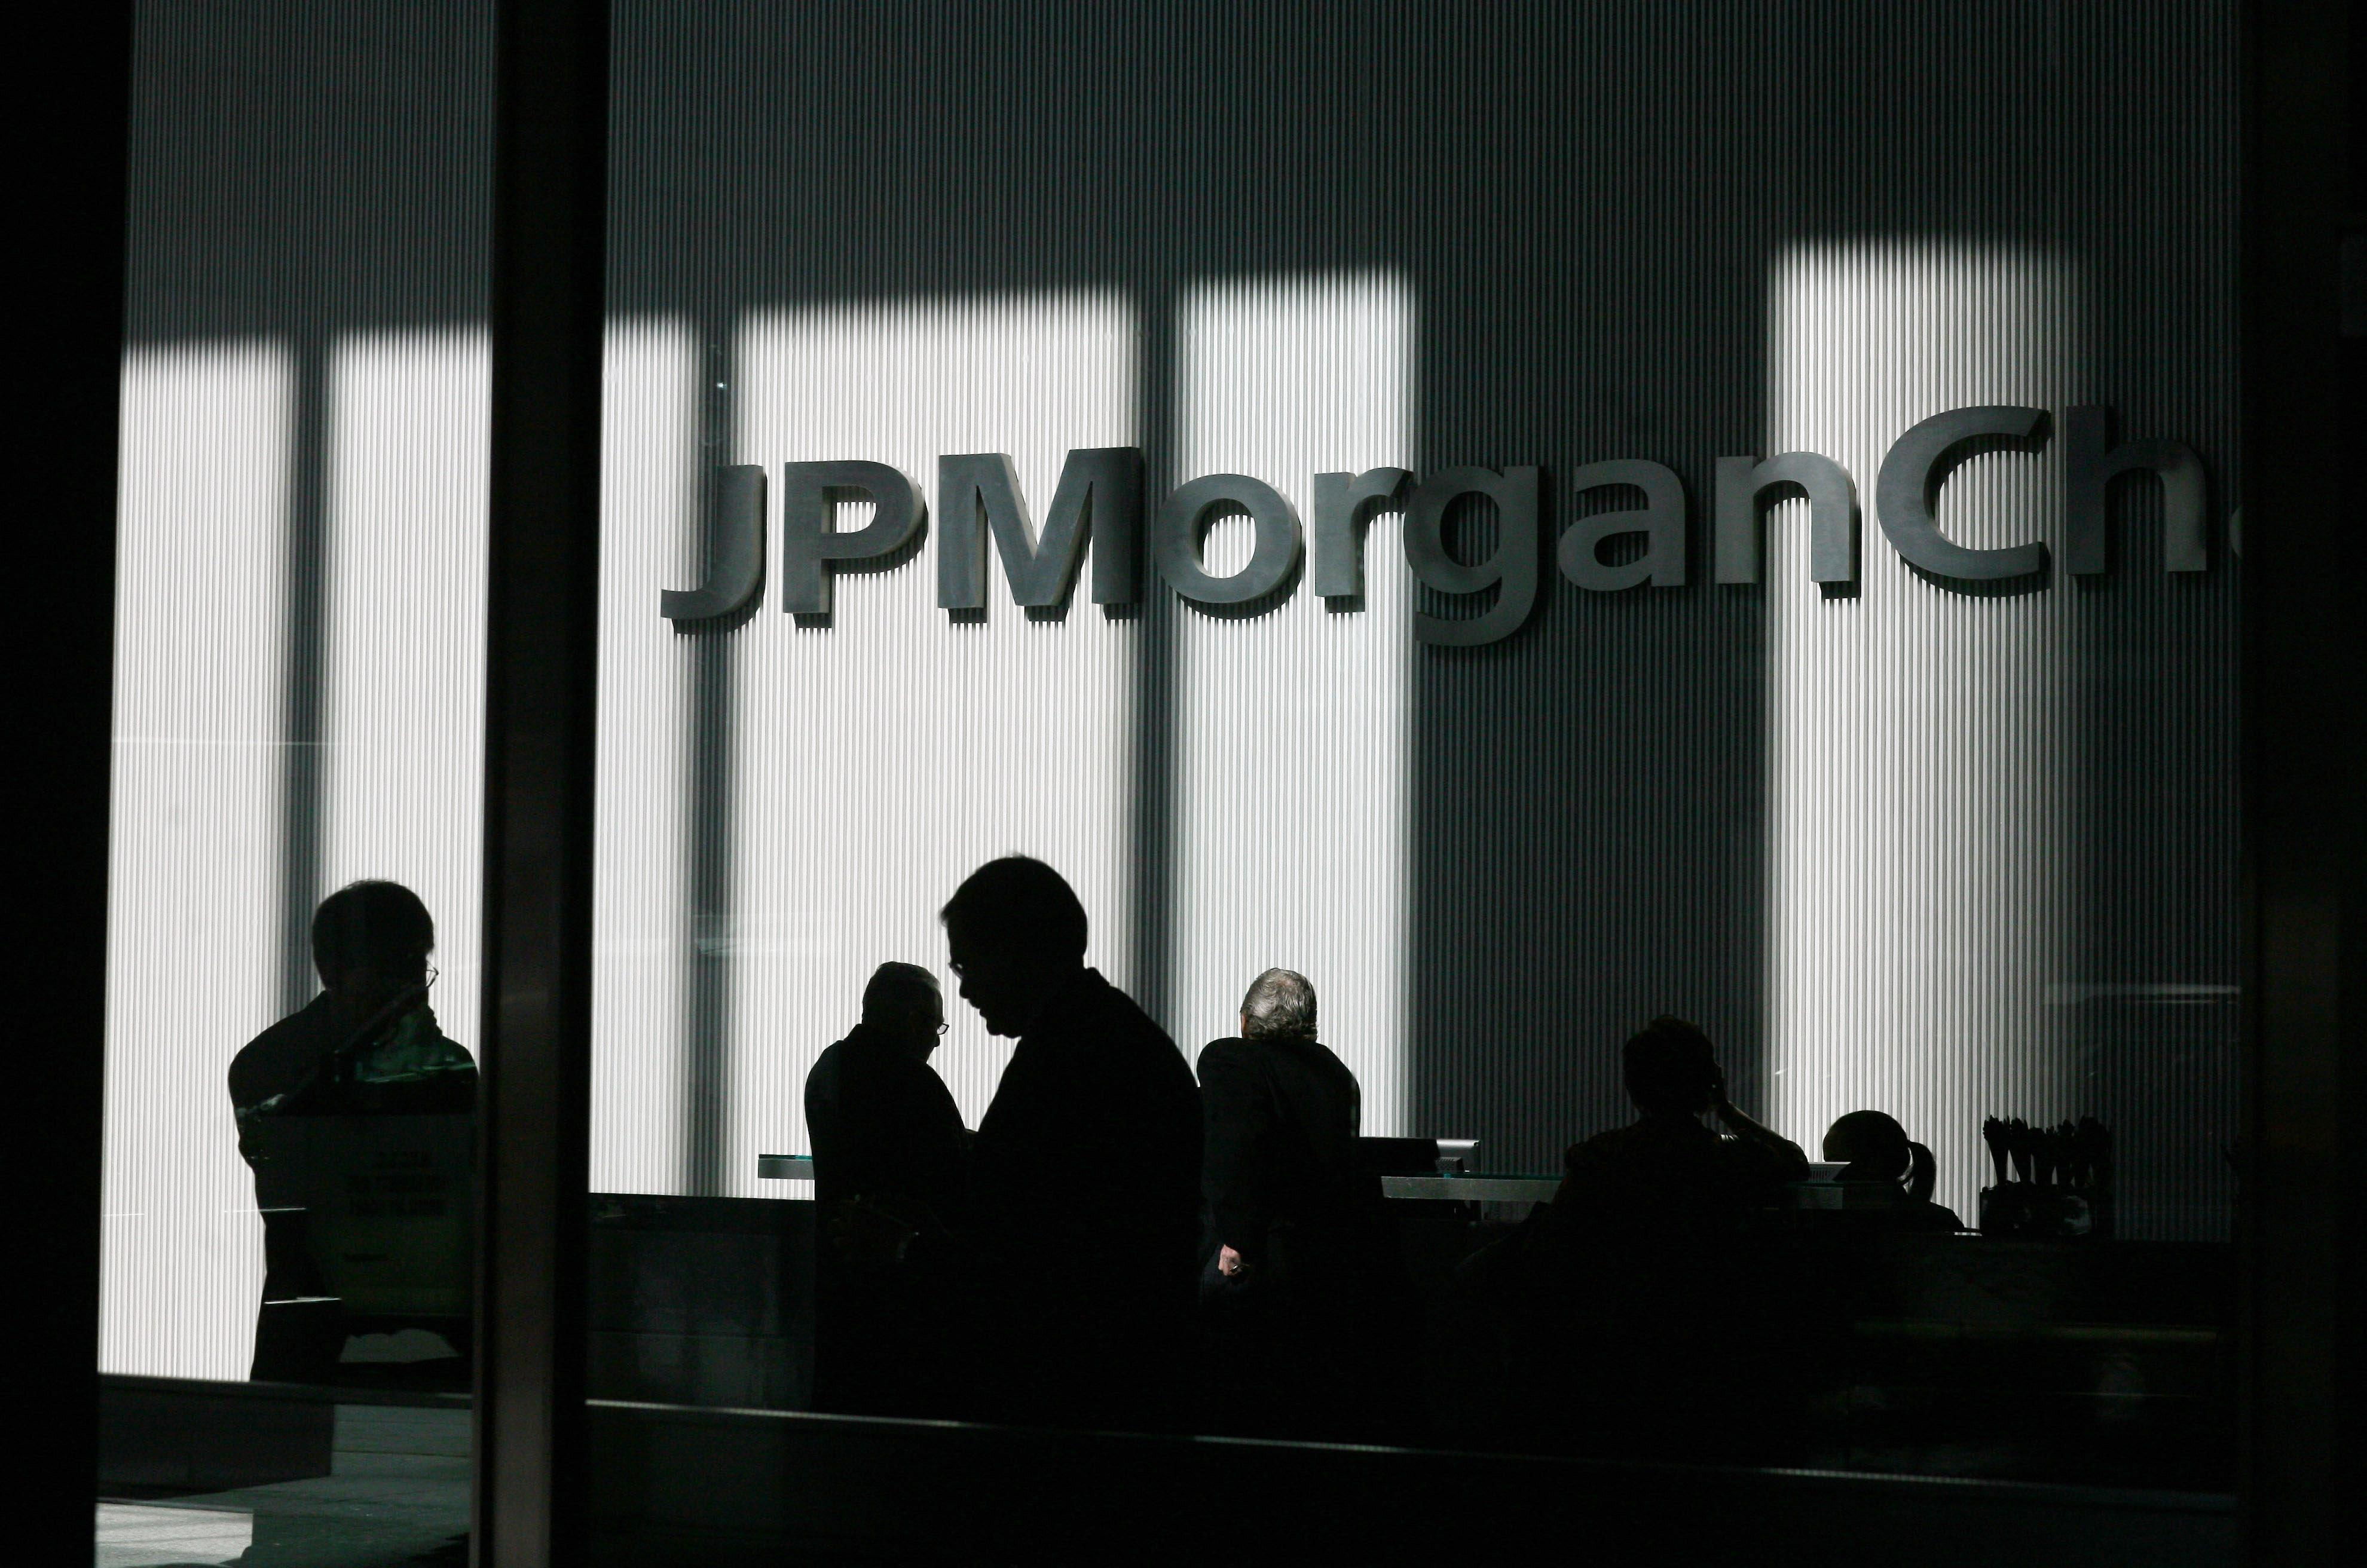 US charges JP Morgan precious metals traders with market manipulation and 'racketeering' - CityAM